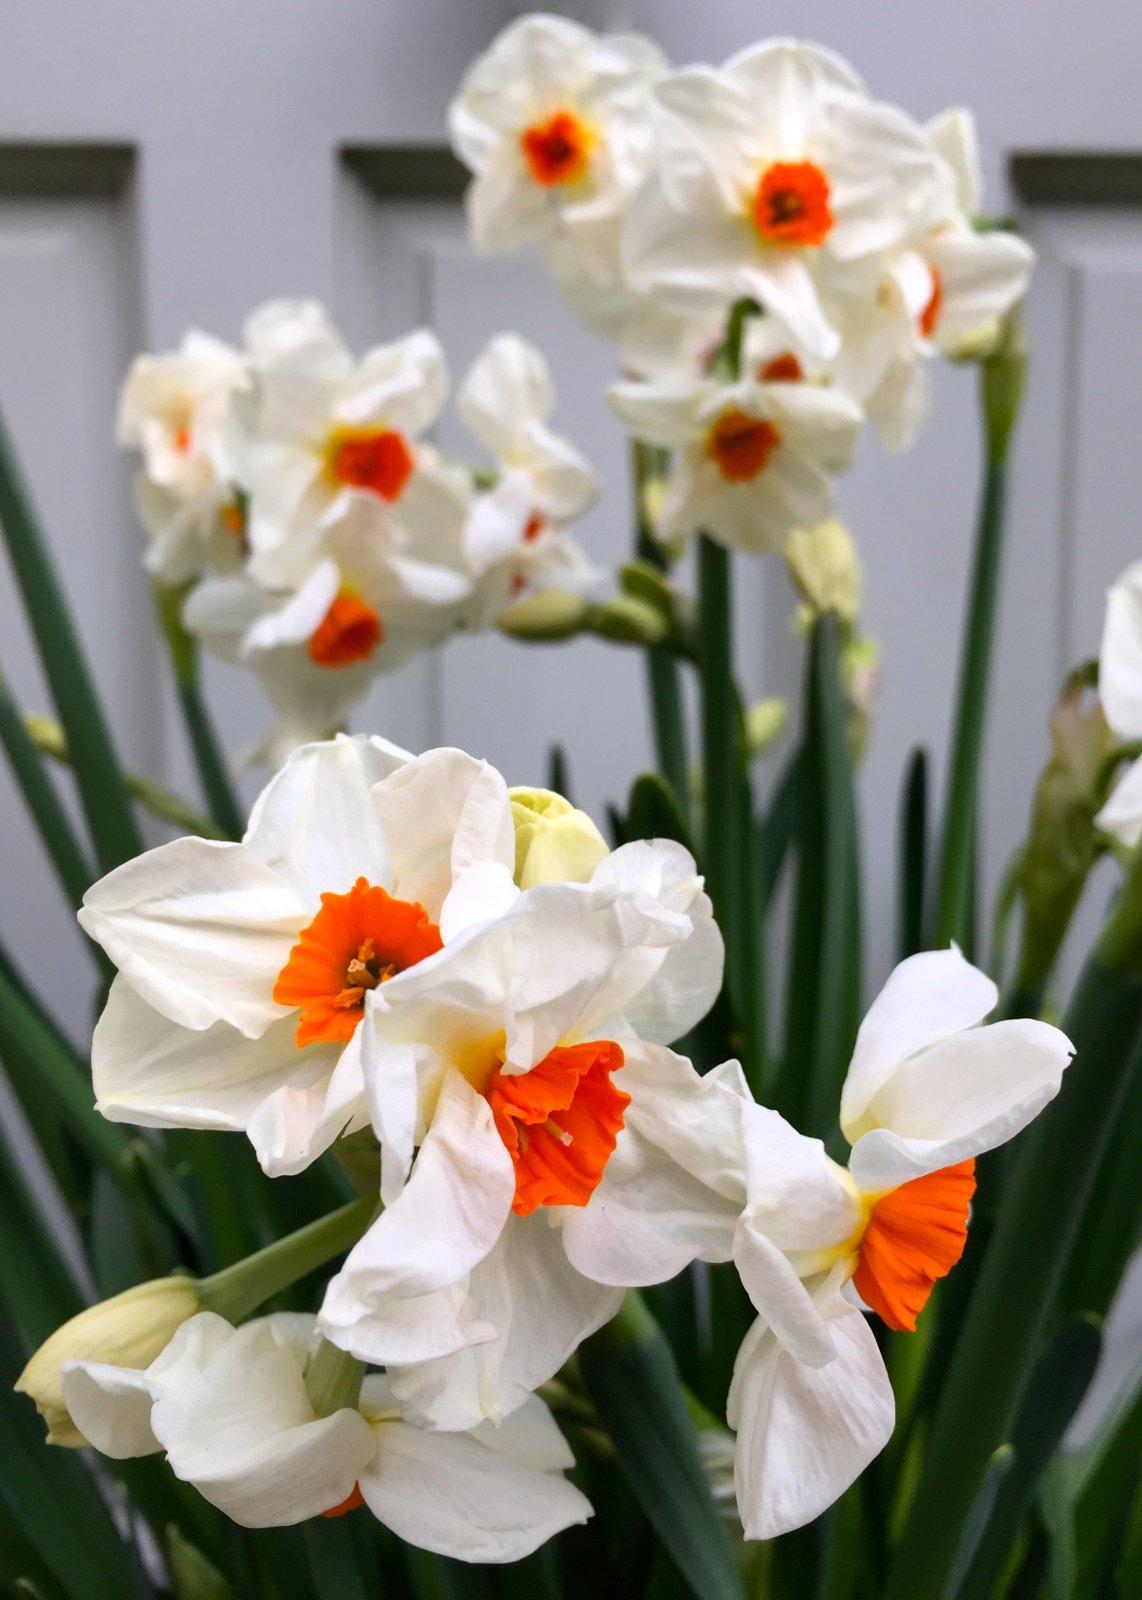 Narcissus-Cragford-3